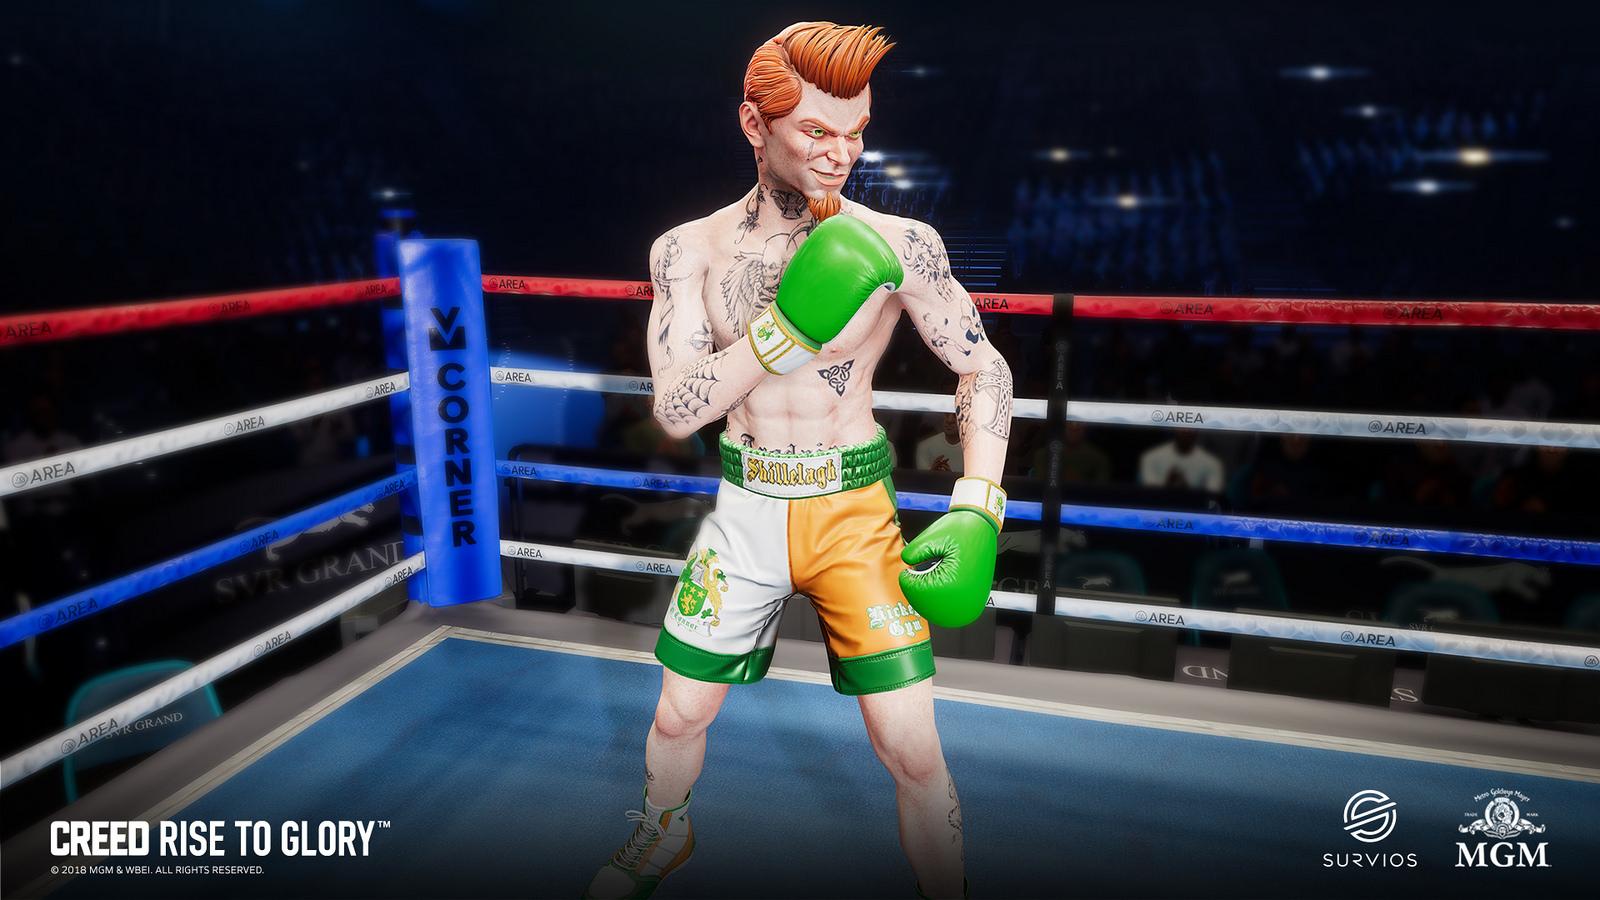 Creed: Rise to Glory trará o boxe em realidade virtual para o PSVR